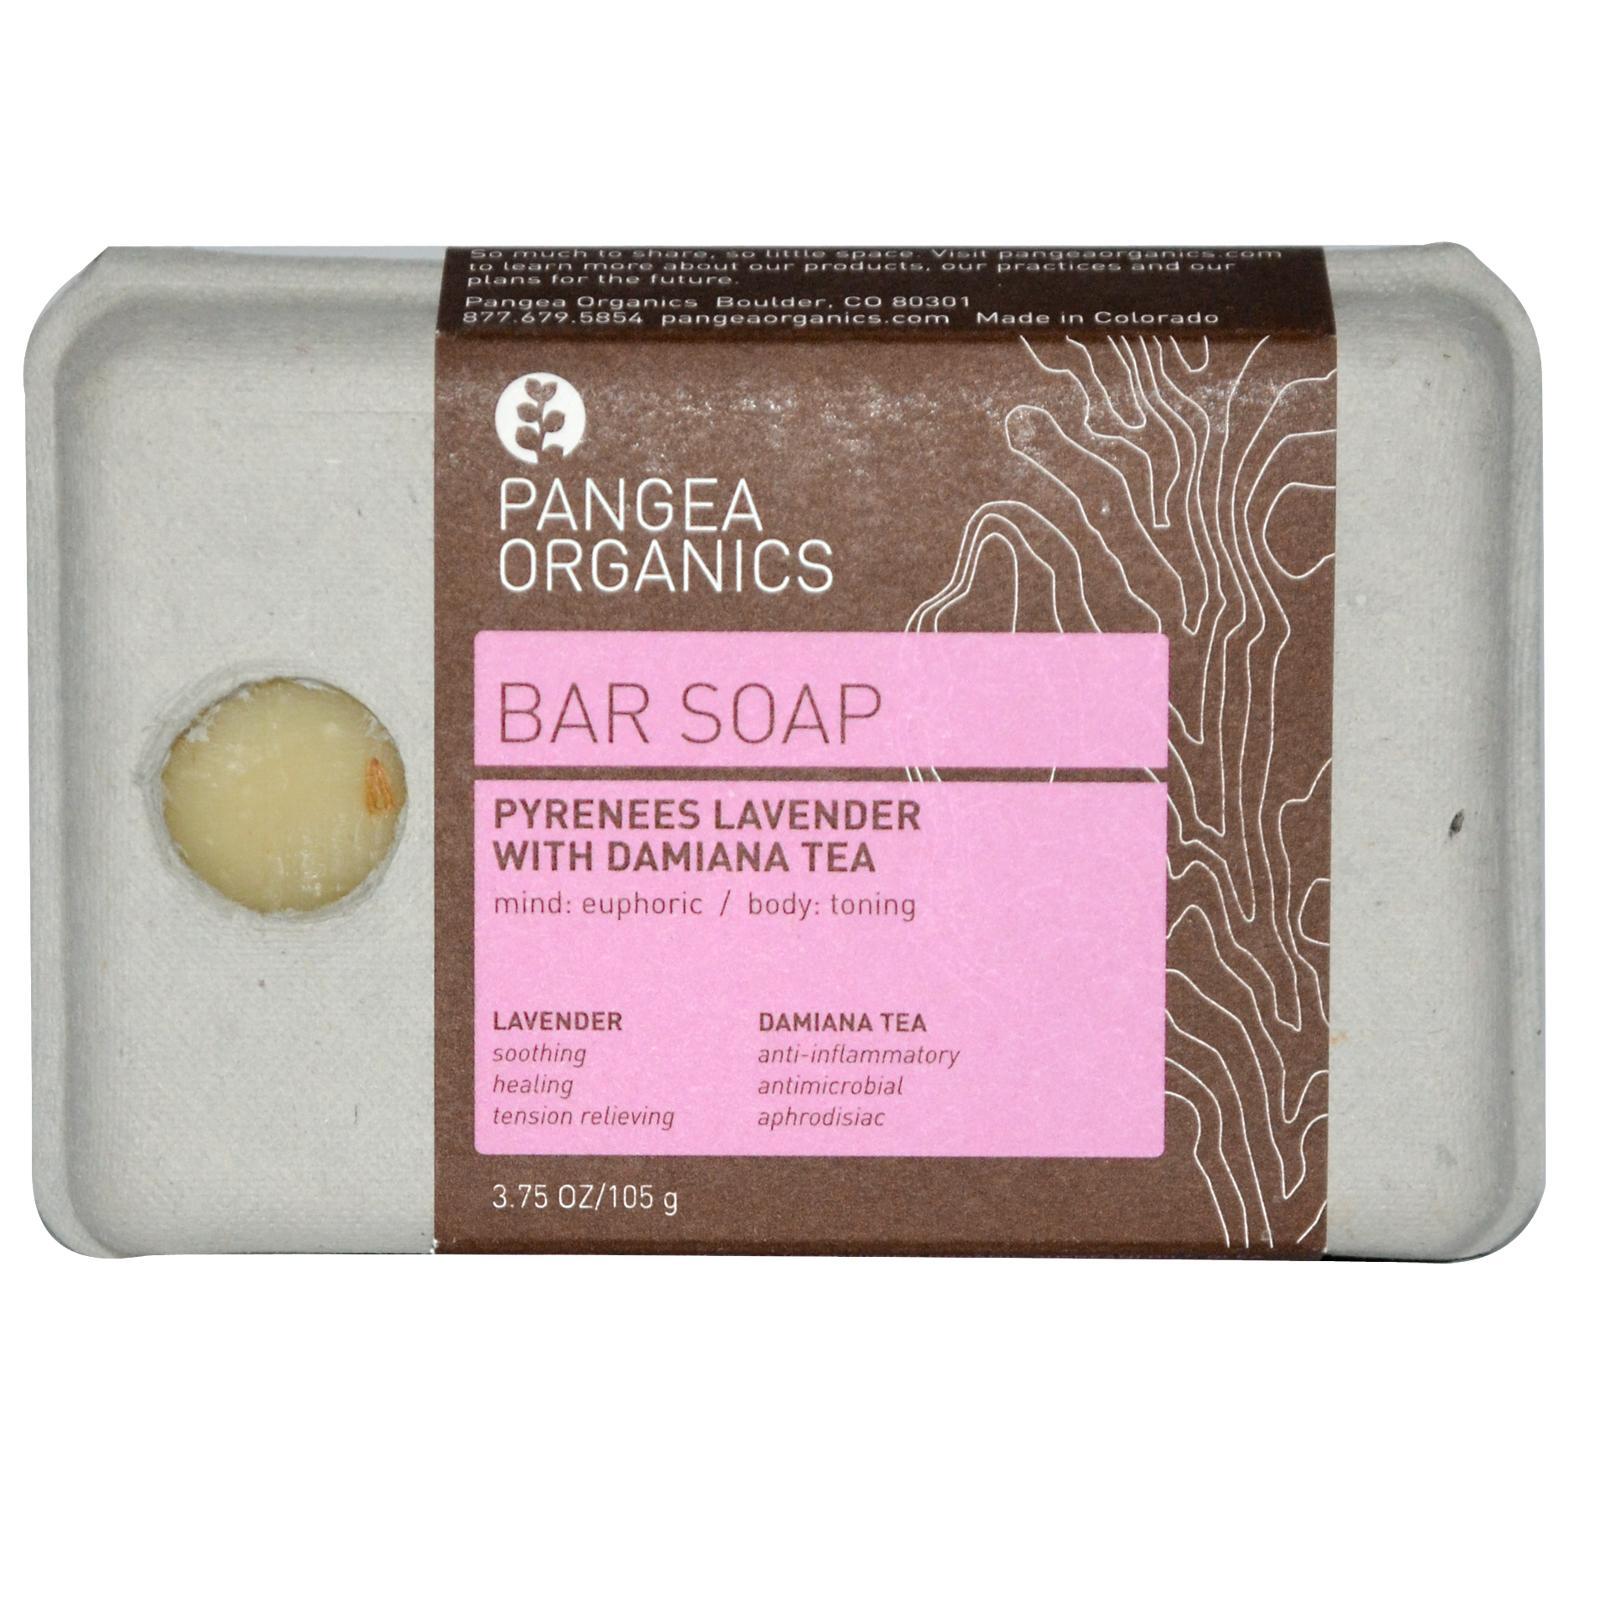 Pangea Organics Bar Soap